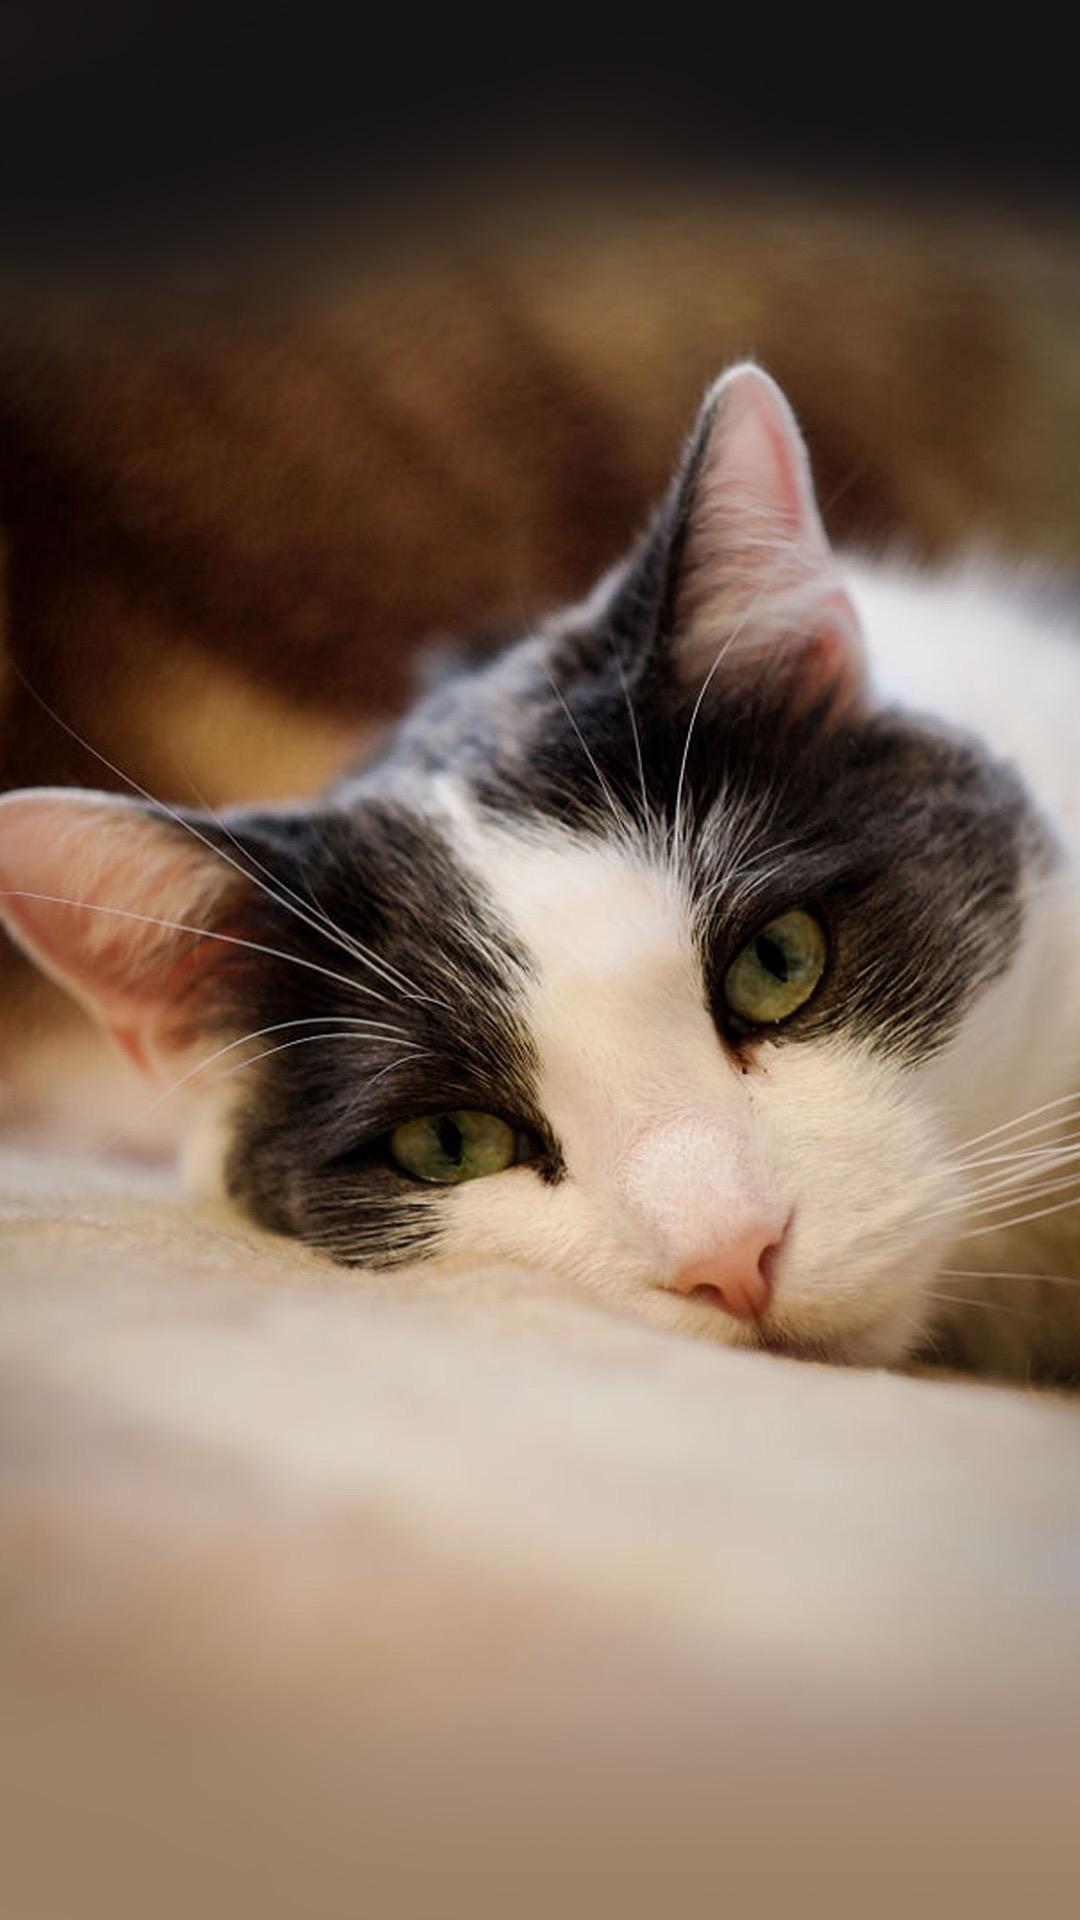 【v粉壁纸】萌宠小猫可爱高清手机壁纸2